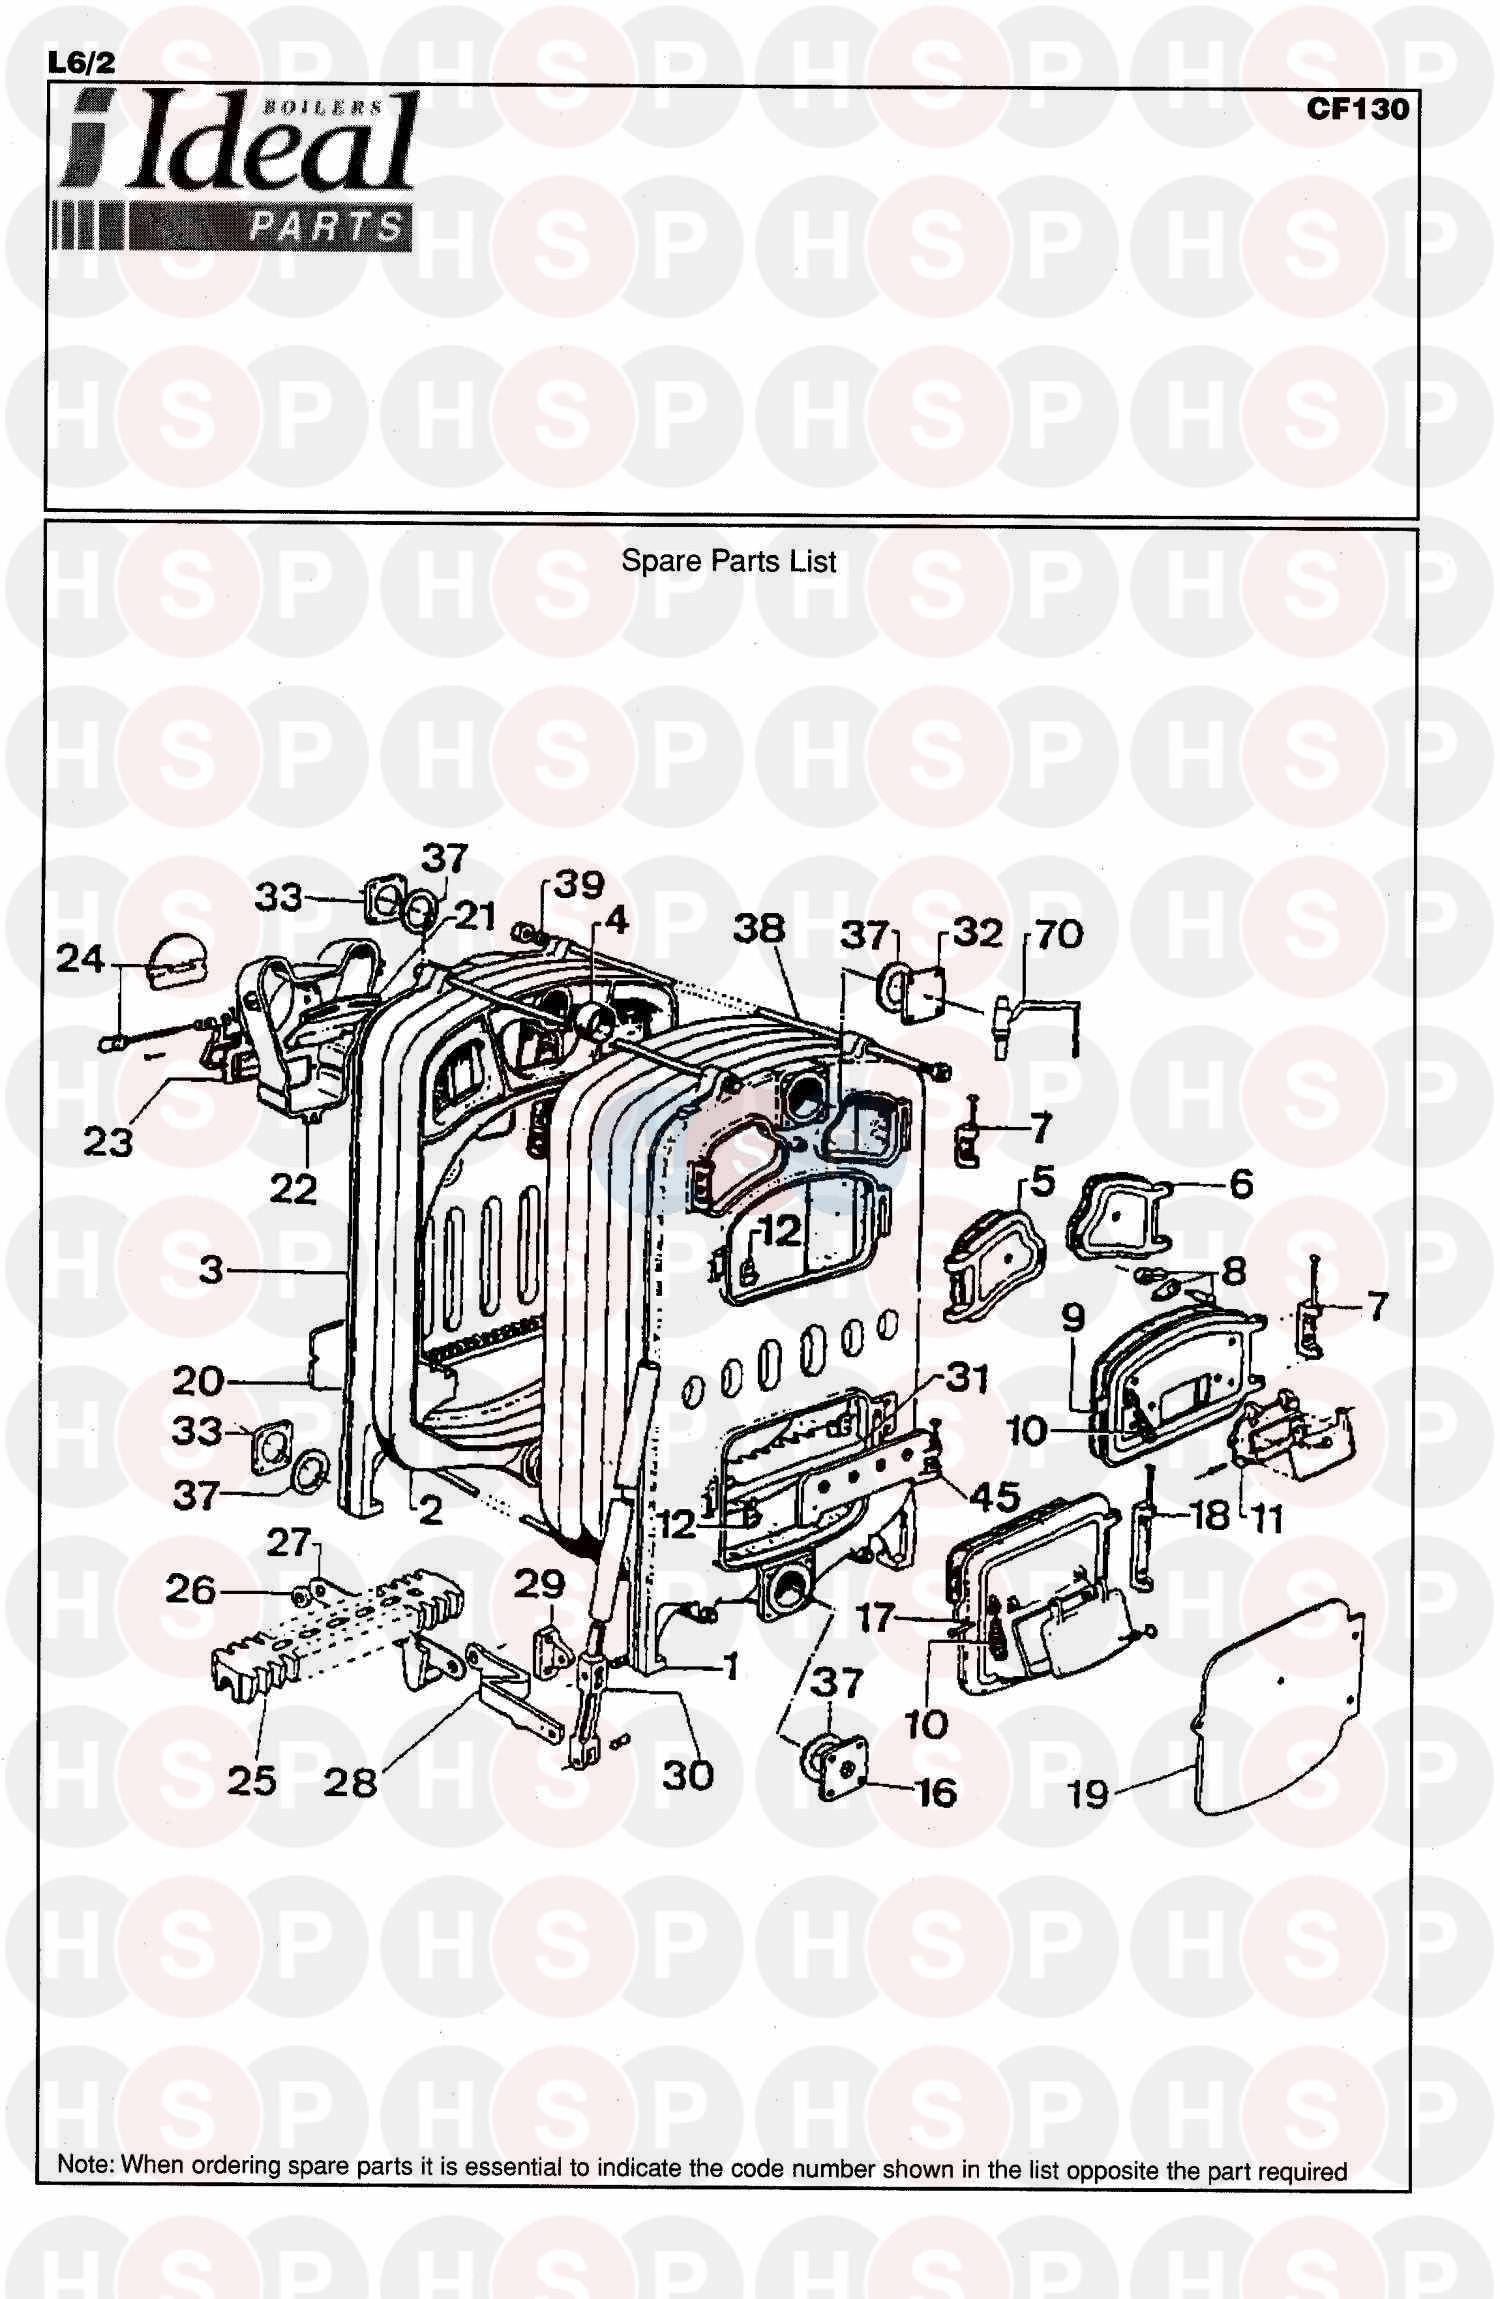 boiler spare parts diagrams & exploded diagram for coalbrookdale  : boiler parts diagram - findchart.co